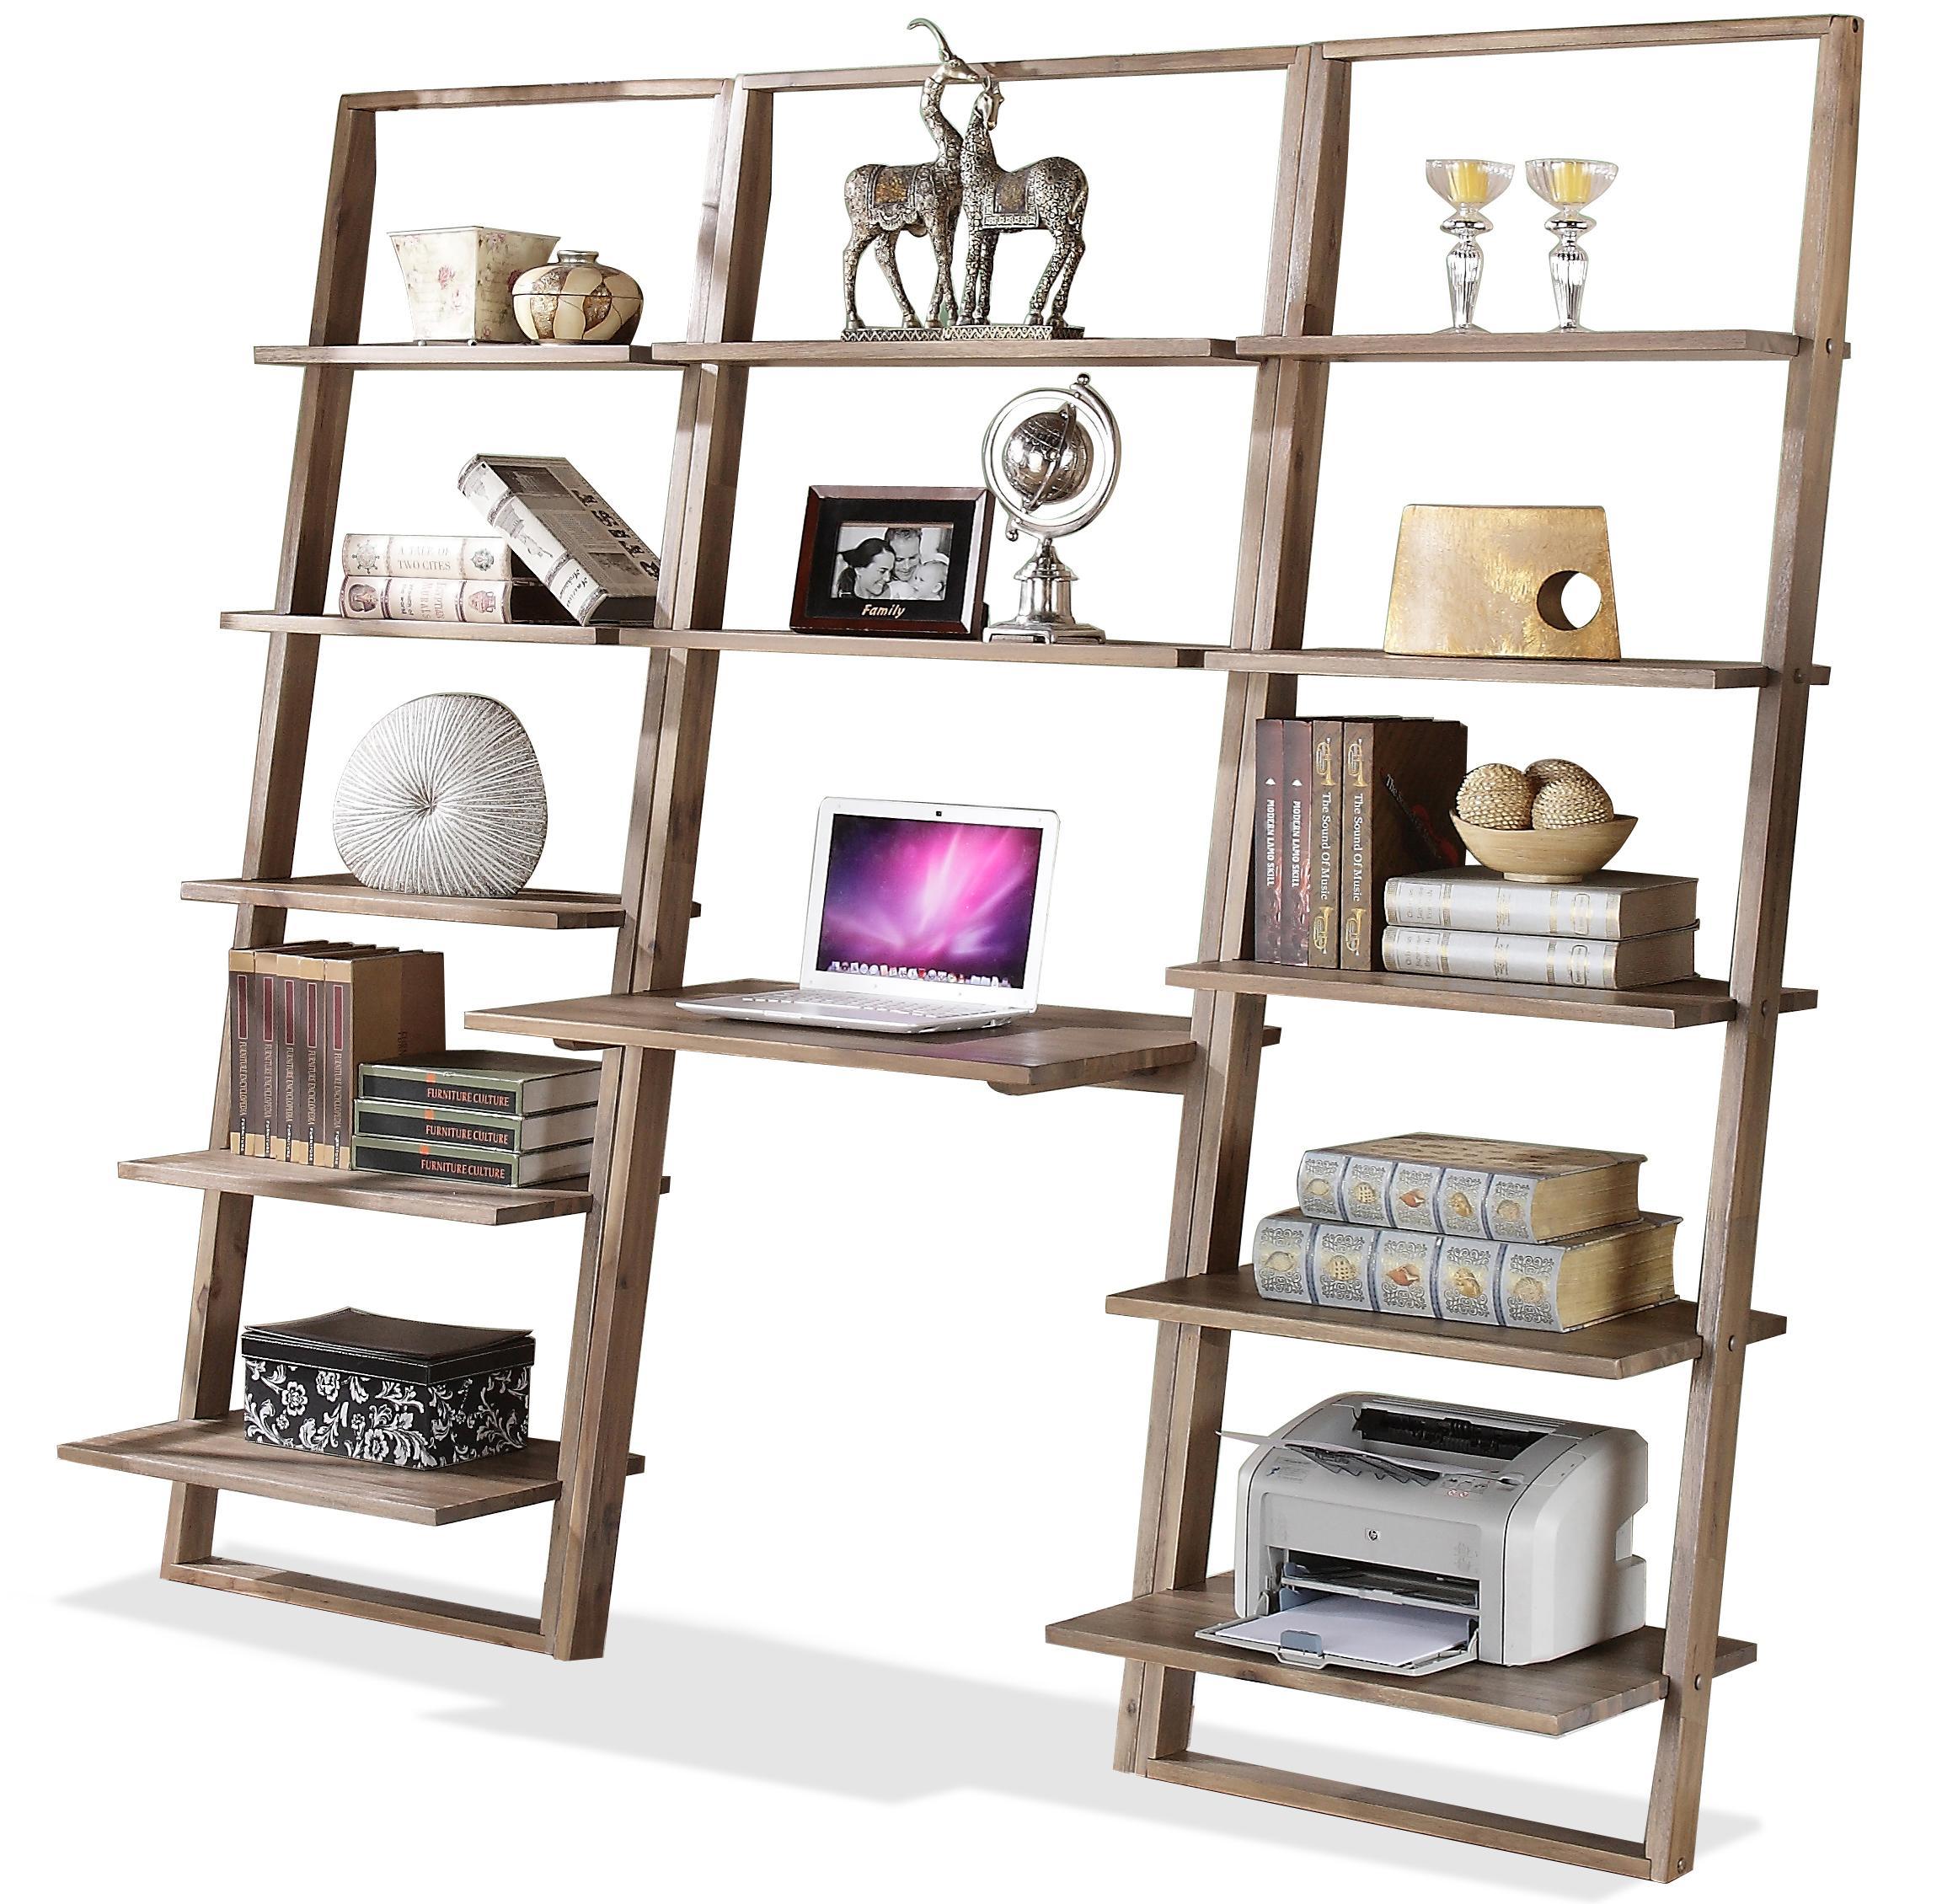 costway black 5tier bookshelf leaning wall shelf ladder book